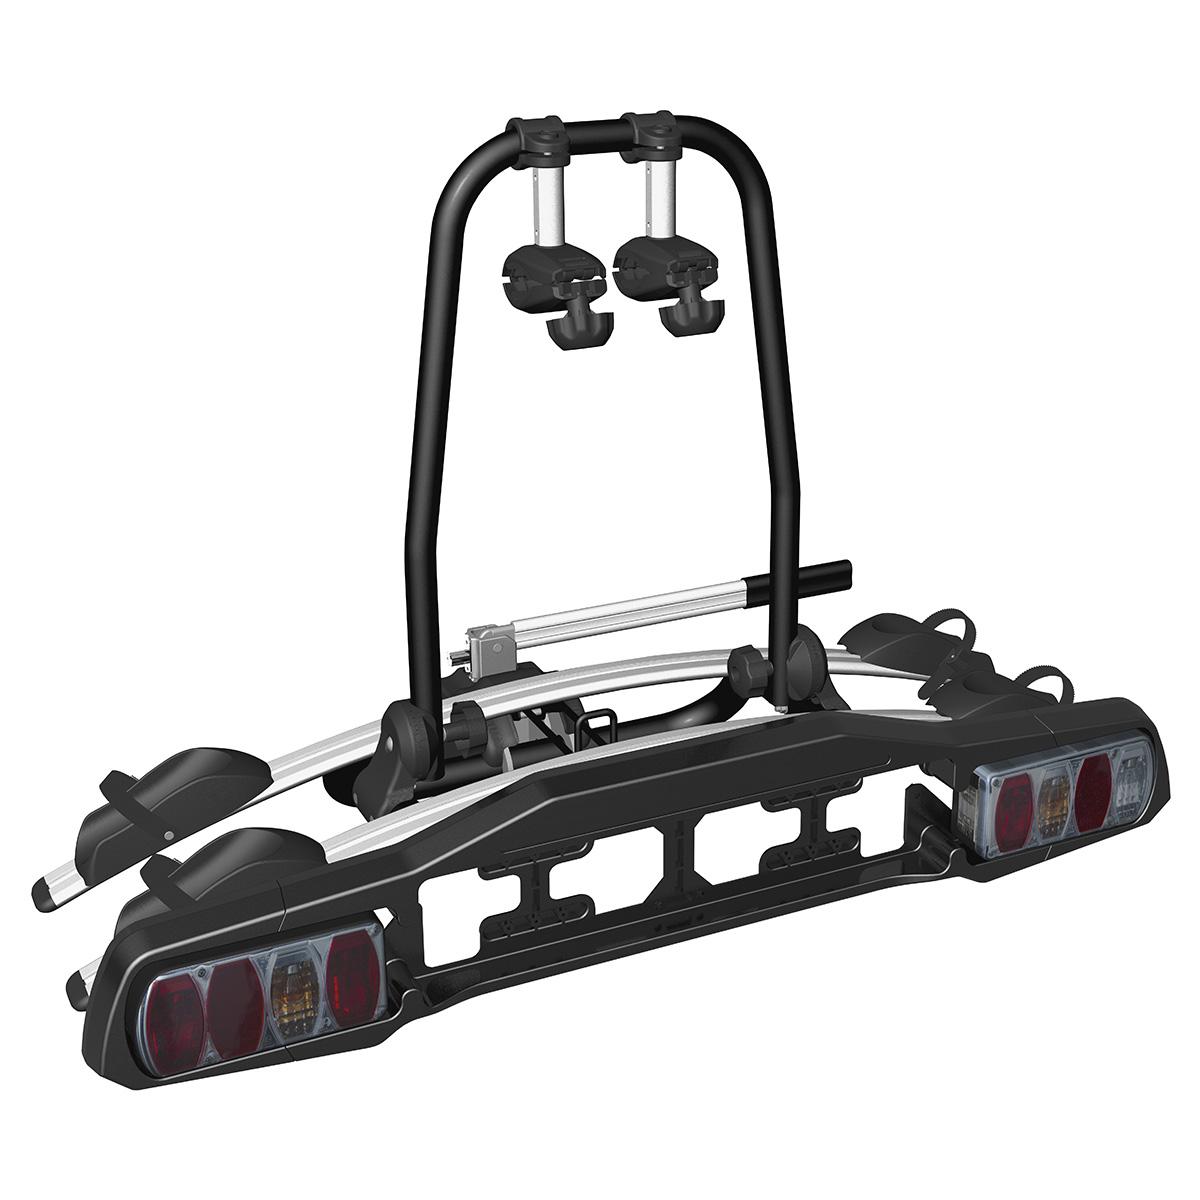 Rawlink cykelholder til 2 cykler   Car racks